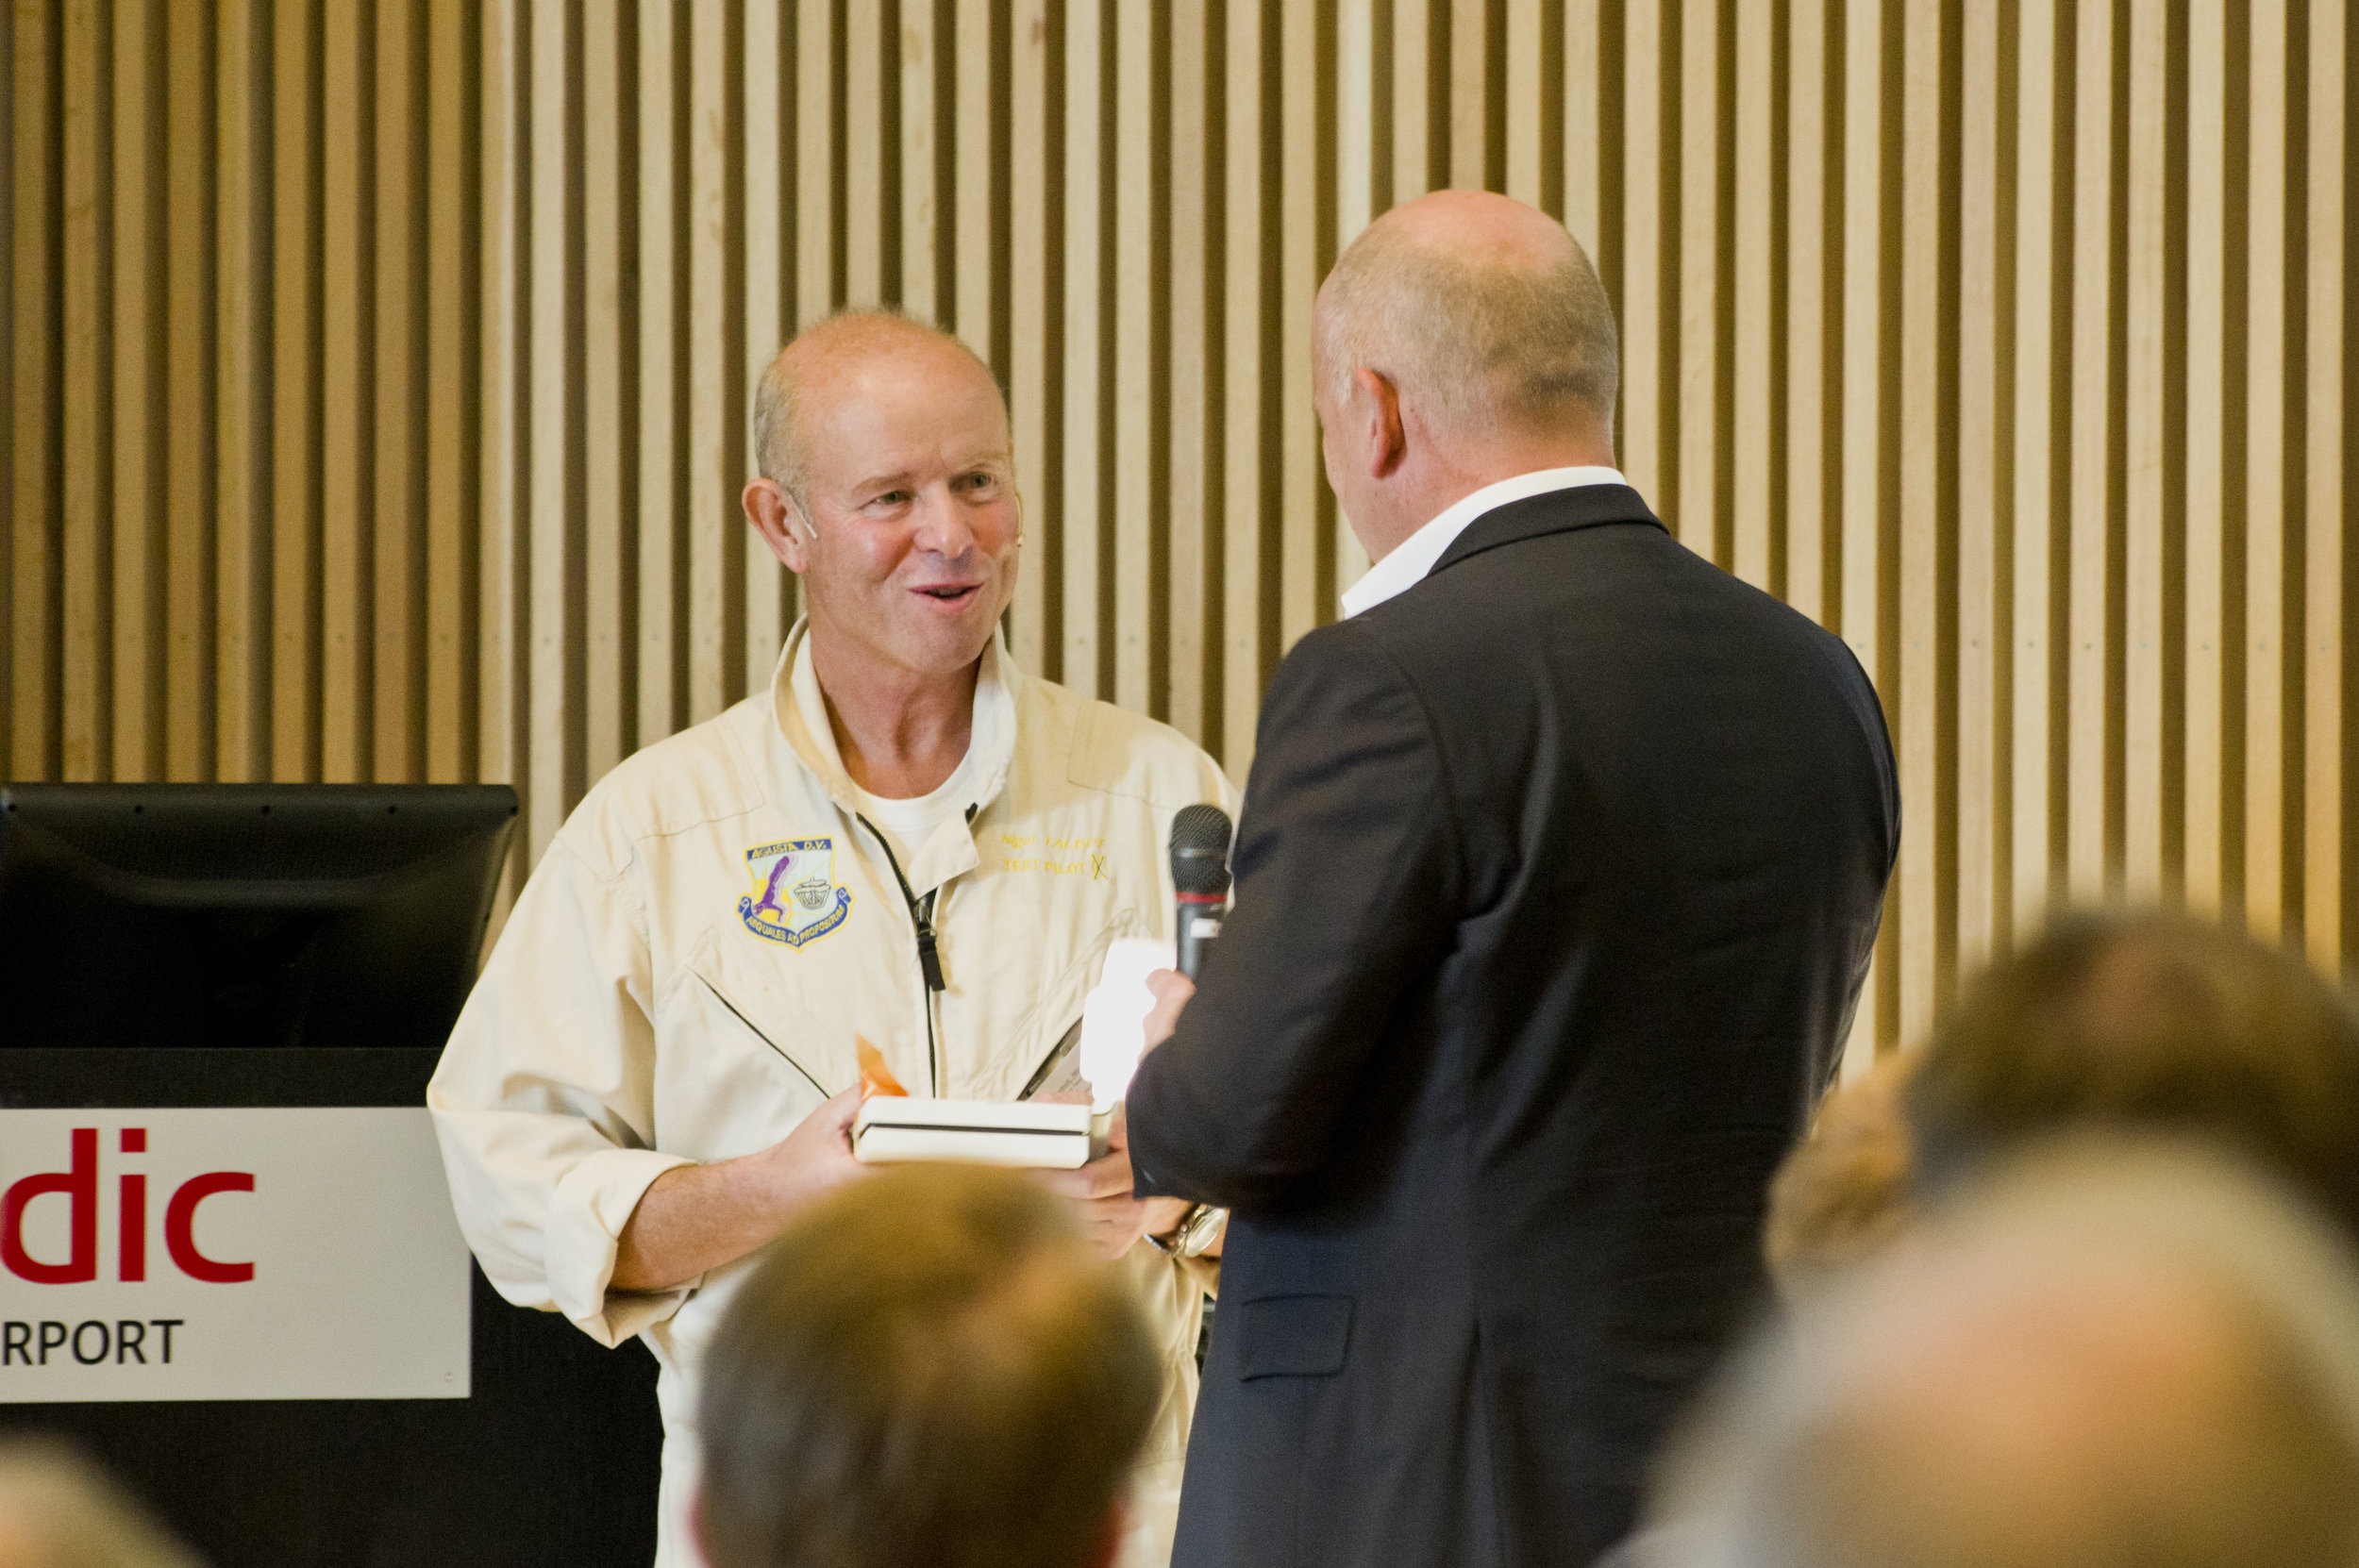 Nigel Talbot og Øivind Solberg.jpg